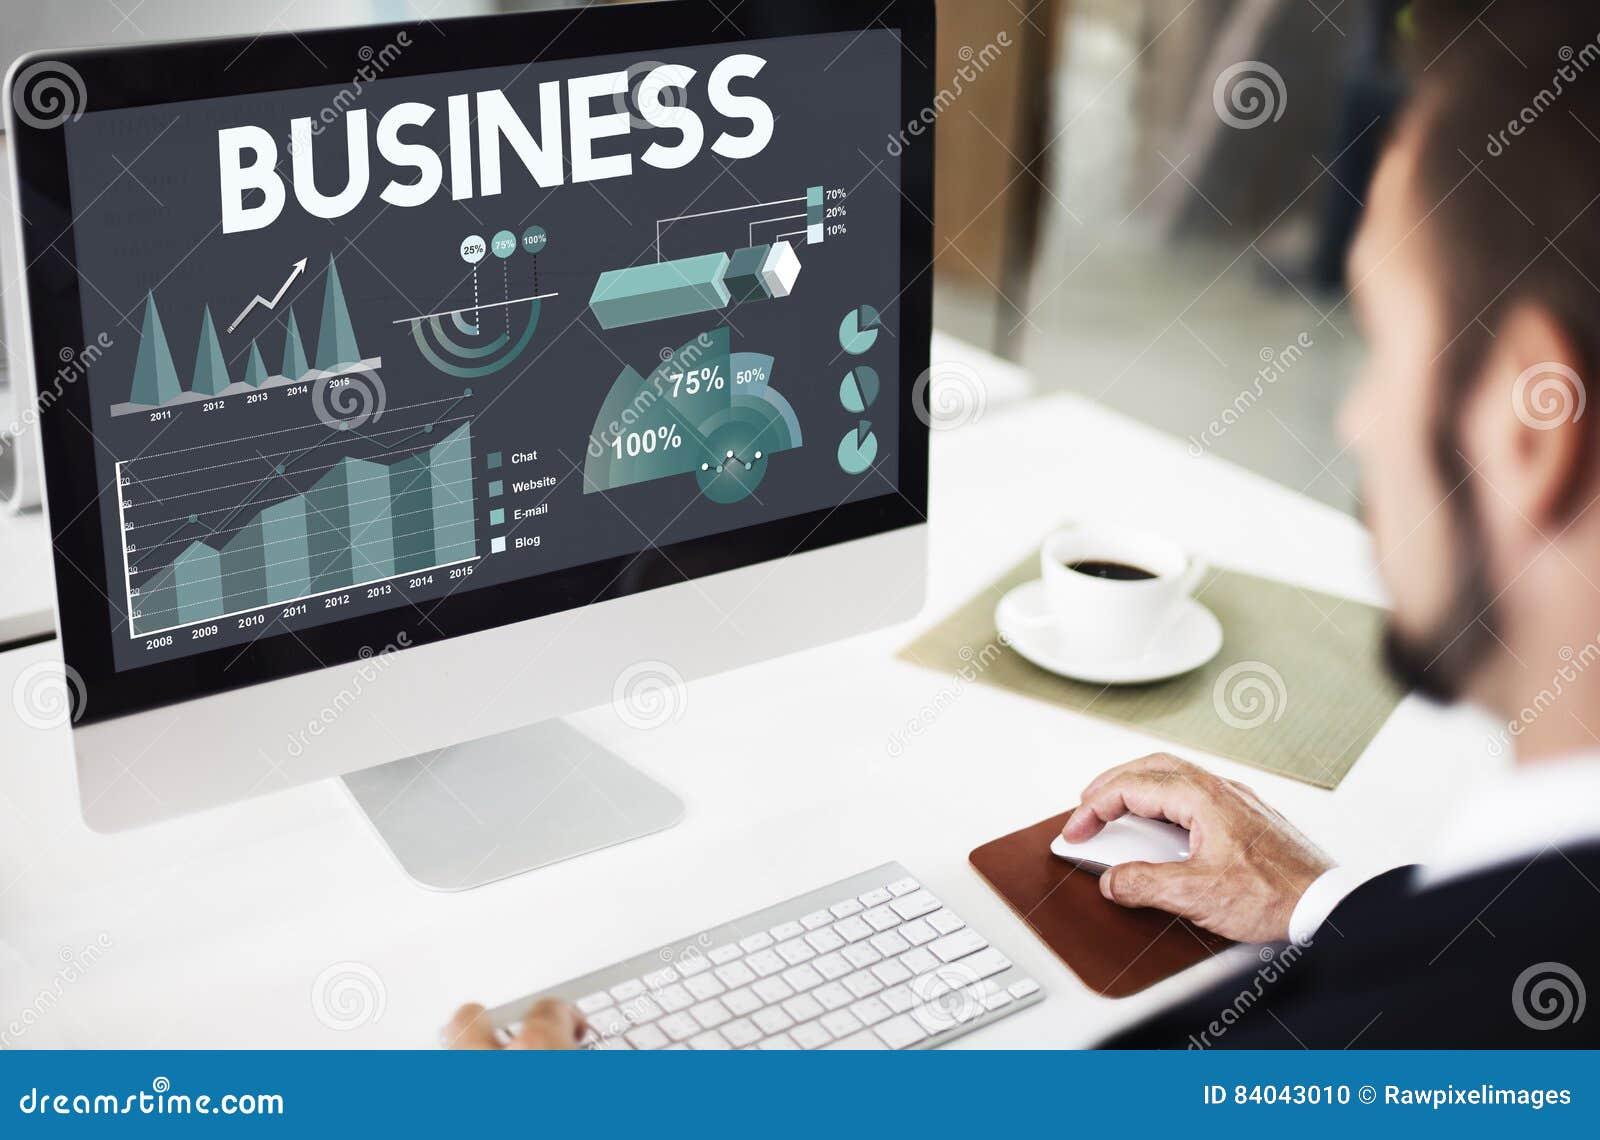 Business Company Corporate Enterprise Organisation Concept